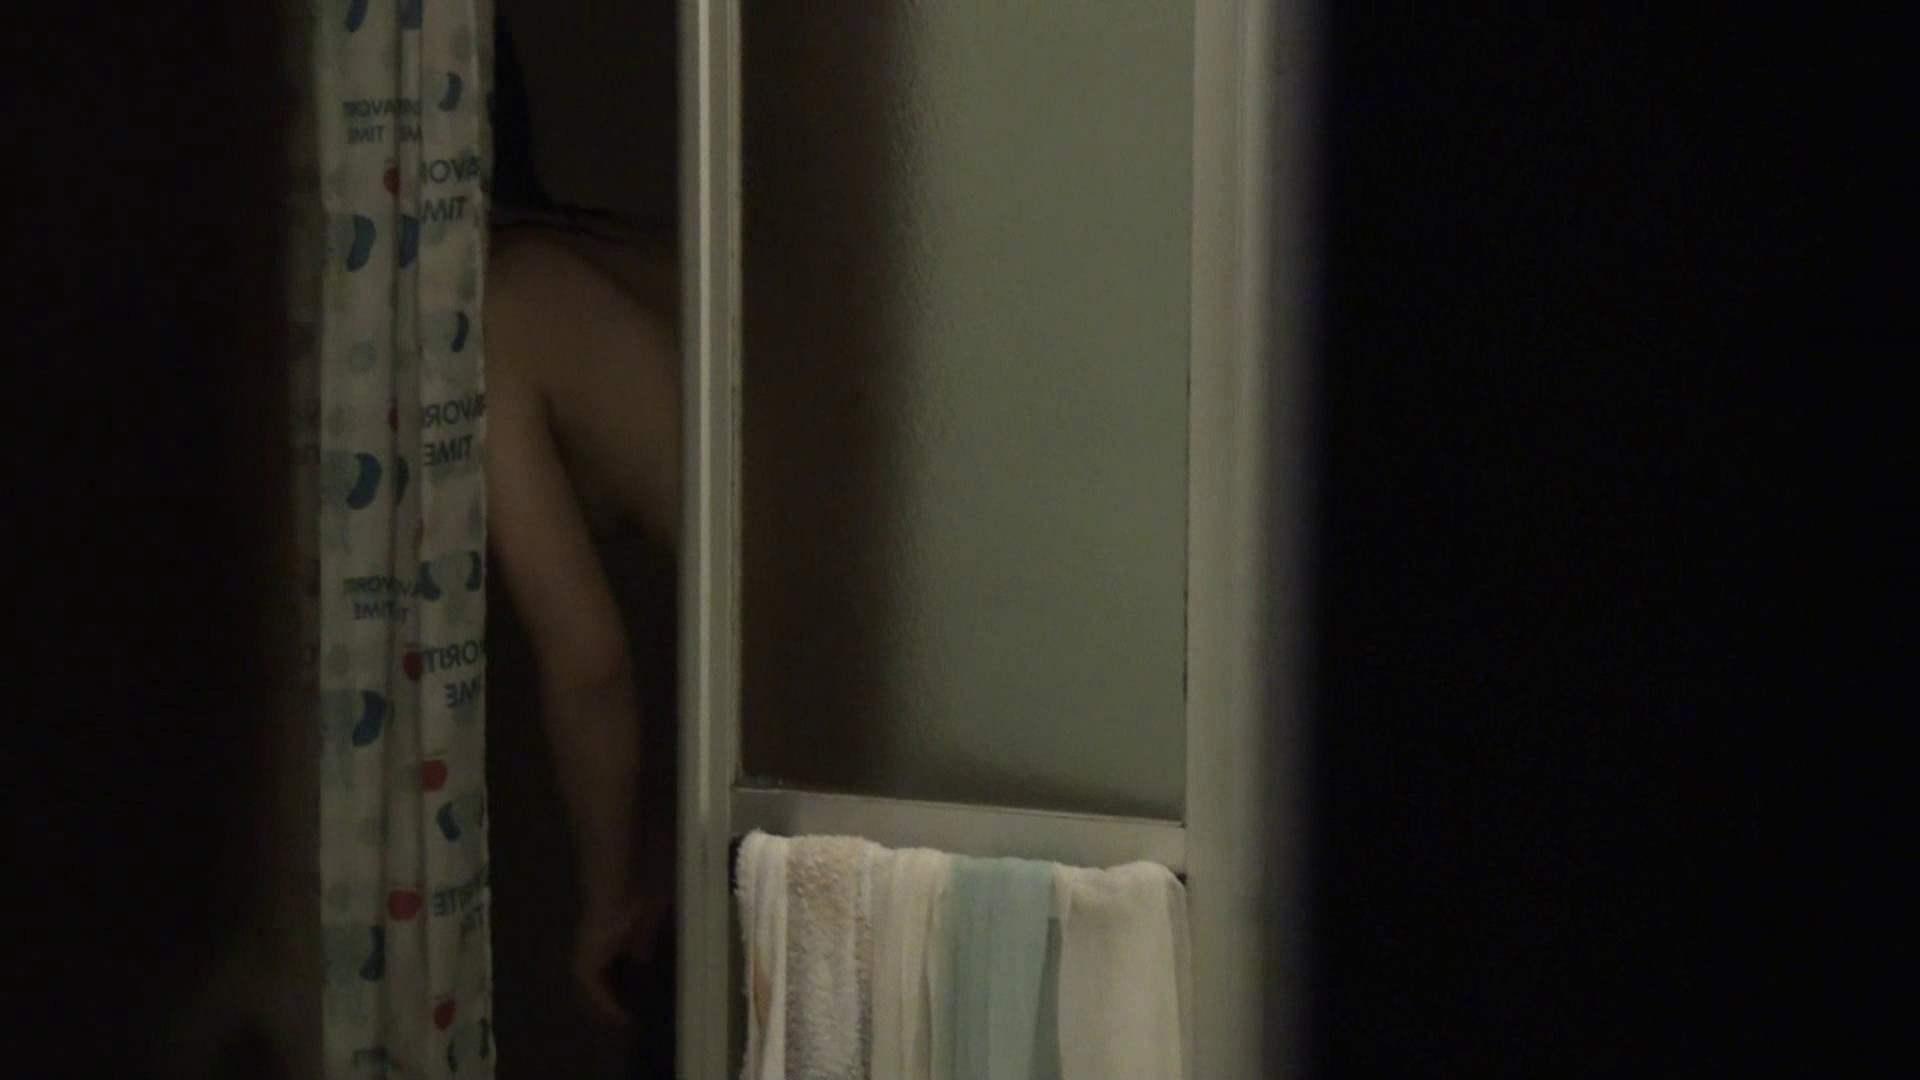 vol.06顔を洗い流す極上お女市さんの裸体をハイビジョンで!風呂上り着替え必見! お姉さん攻略 スケベ動画紹介 68画像 18